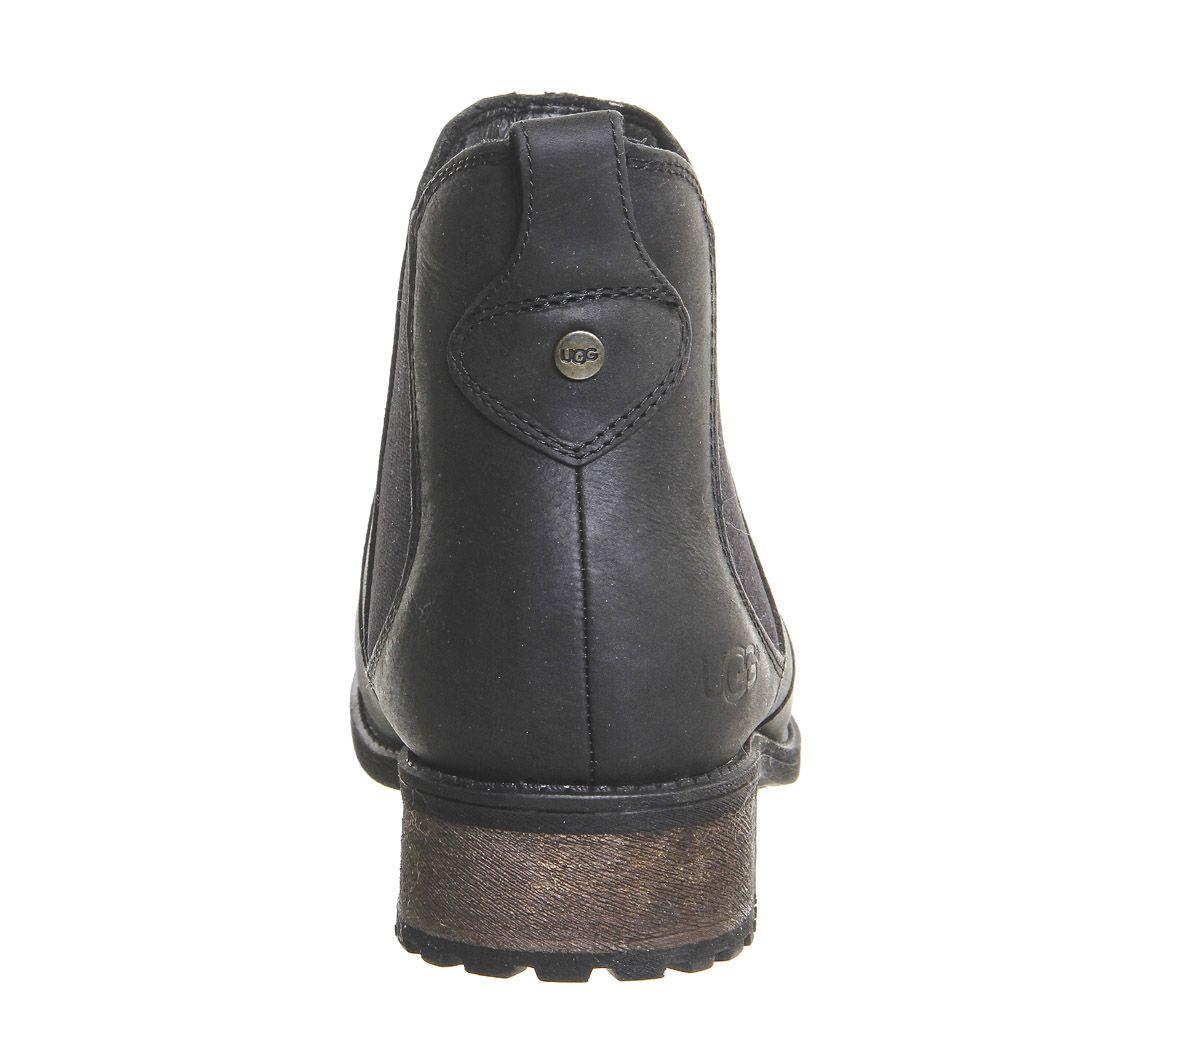 Ugg Bonham Chelsea Boots Black Leather Ankle Boots